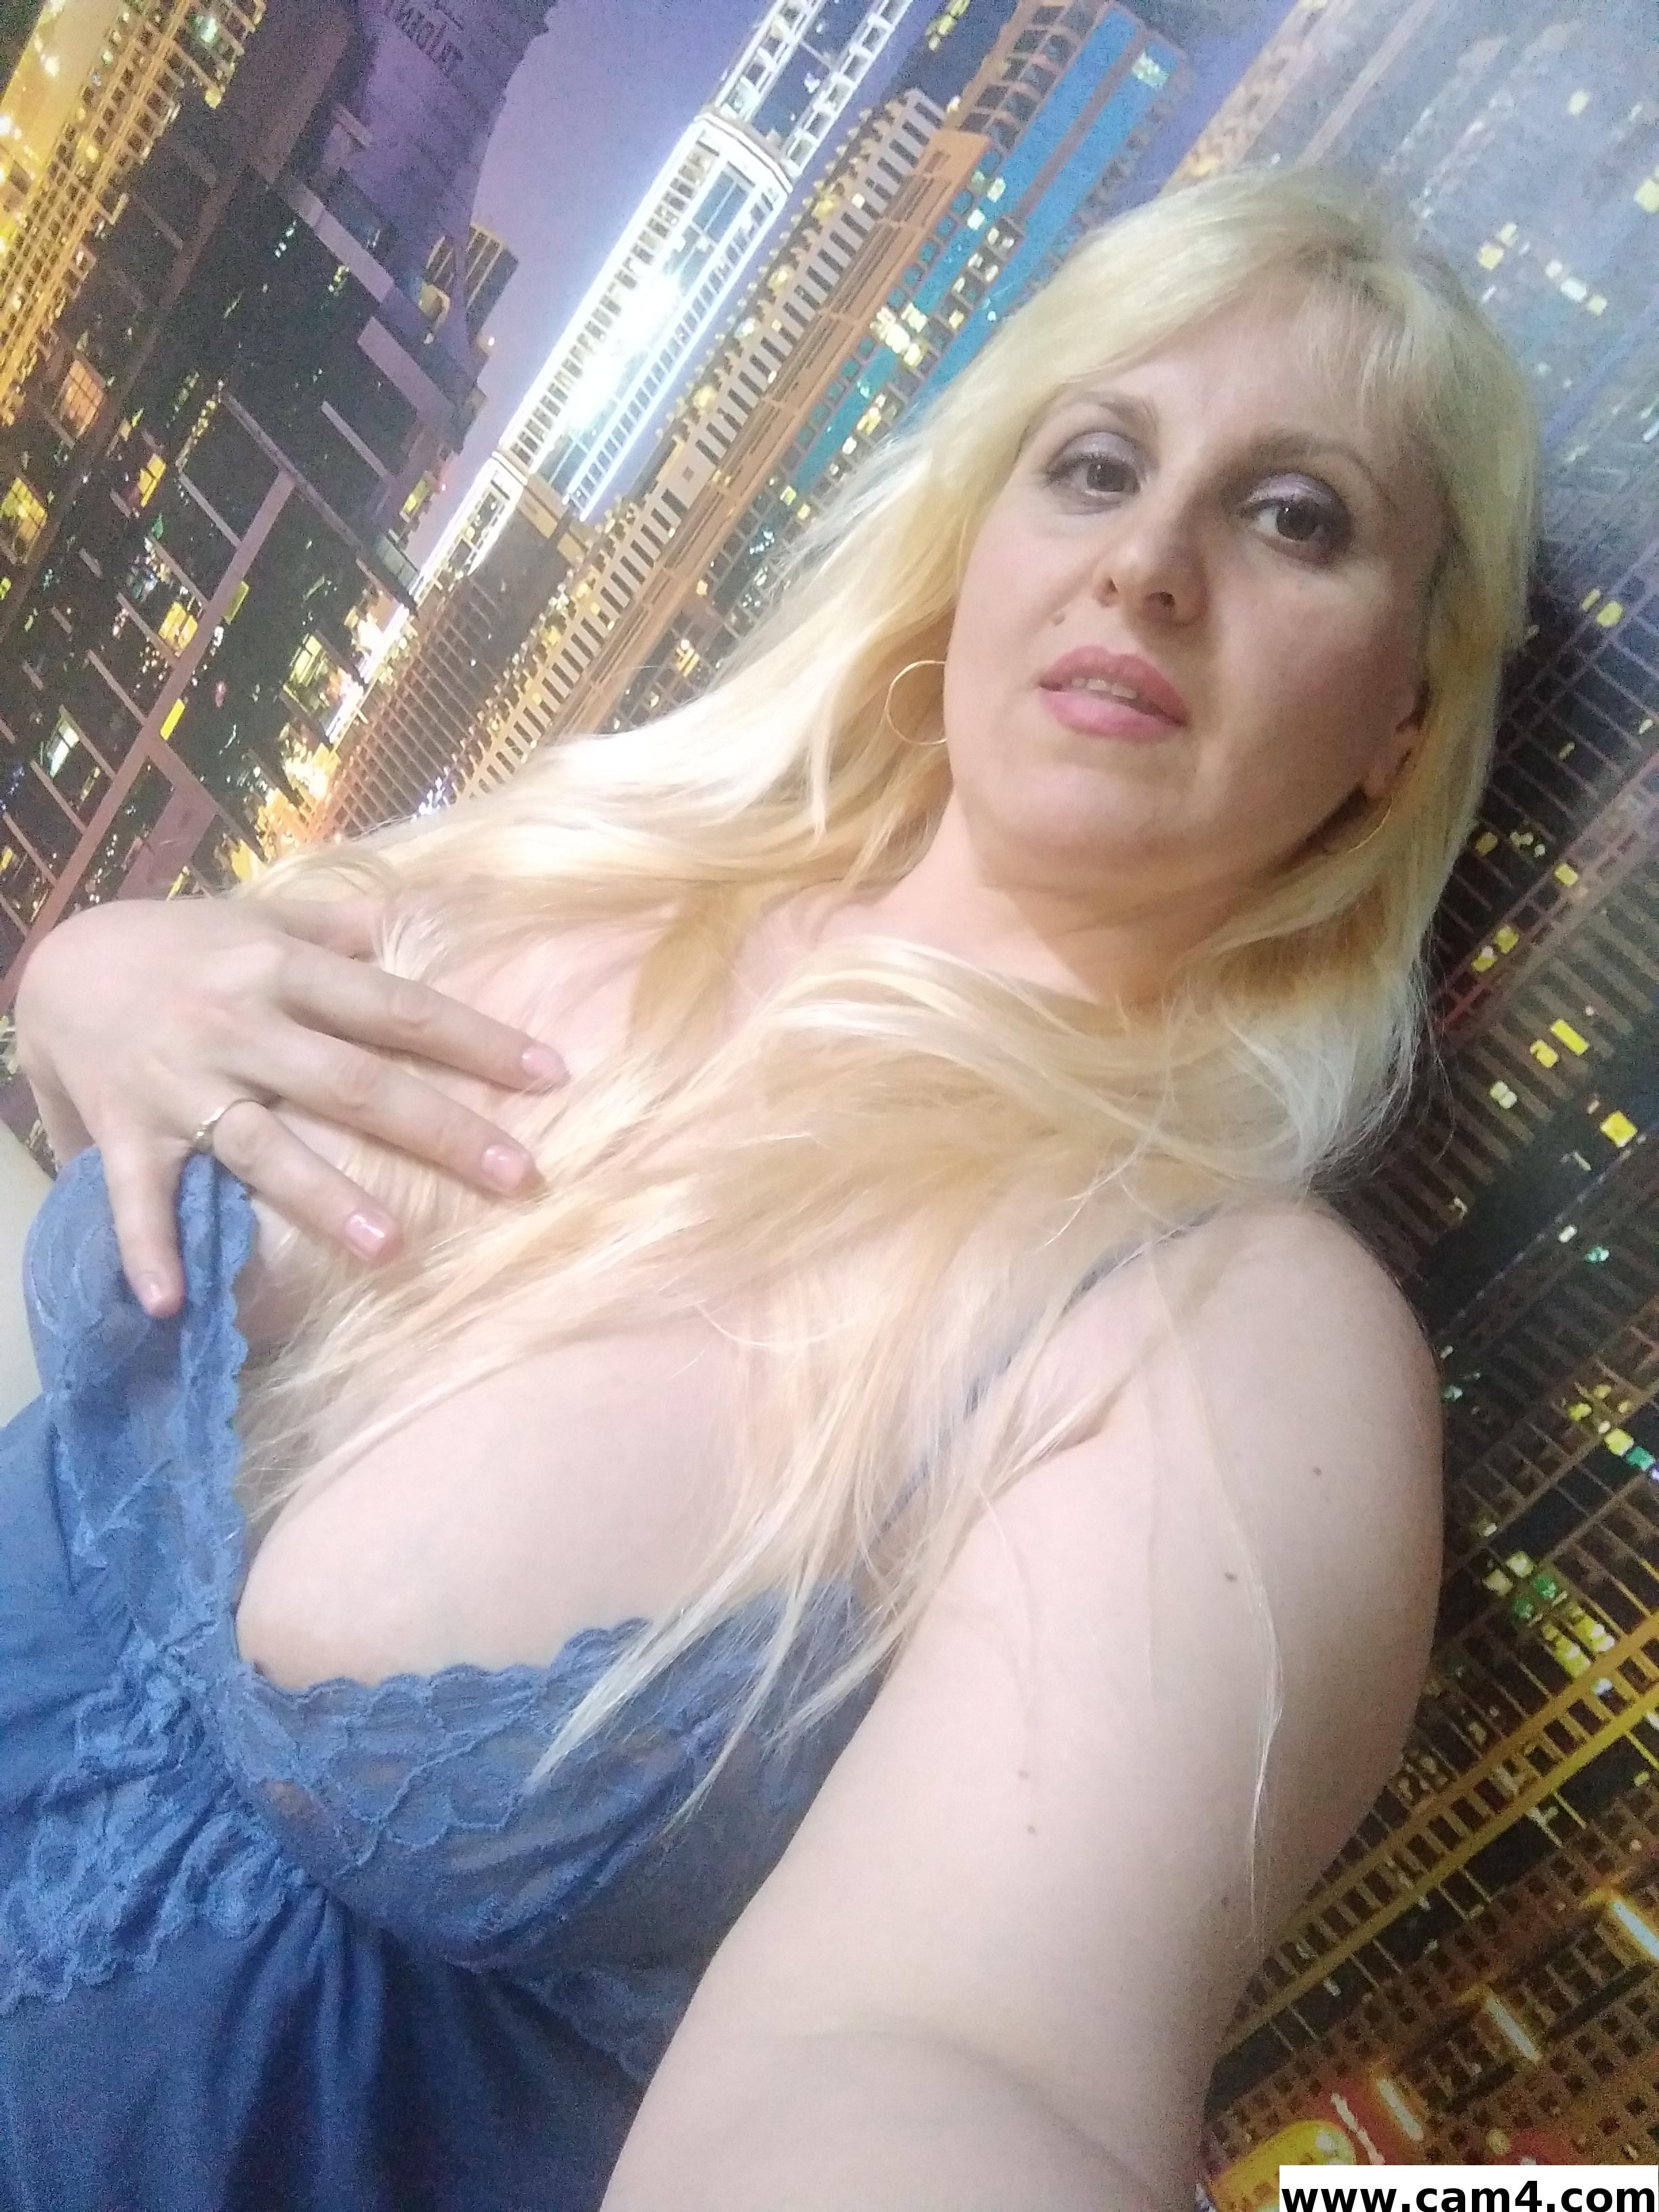 Blondabella?s=gtn7imn1ykyl3dhvecoqwpznqfjmlrkoyrn8uq0wtdu=